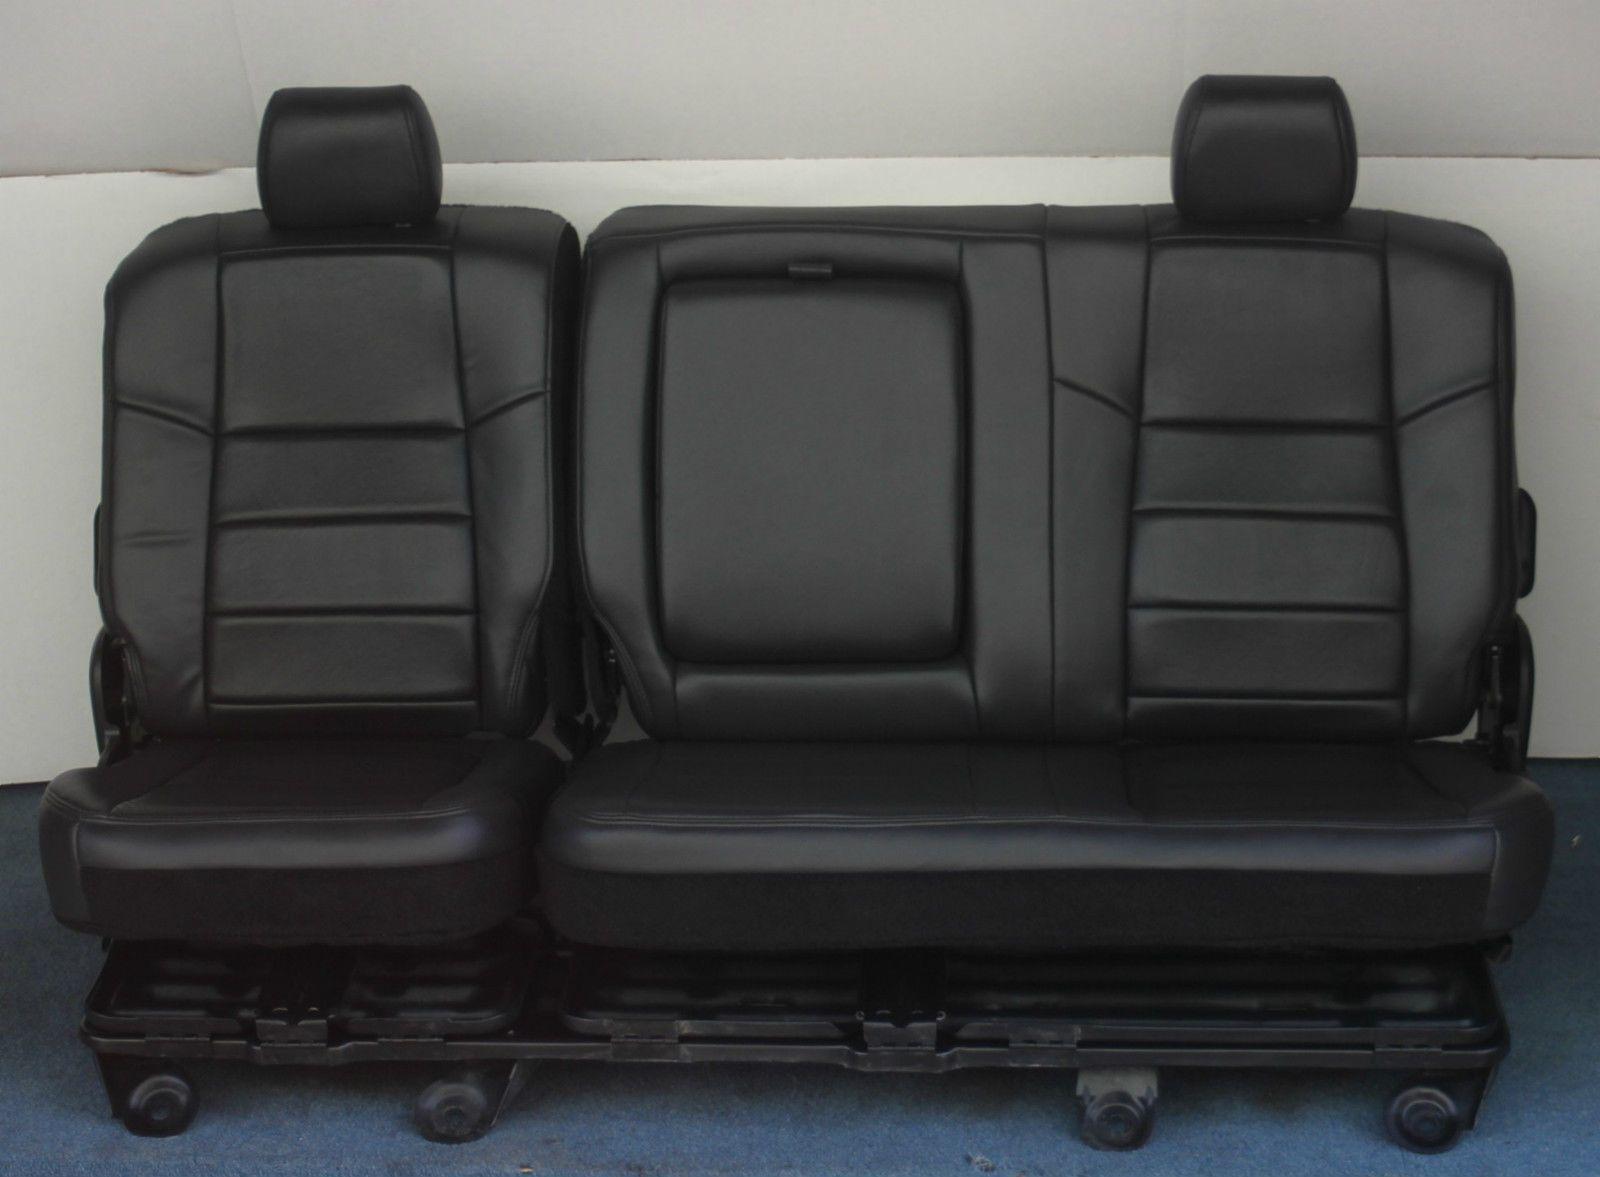 2007 2006 2005 F250 F350 Crew Cab Black Leather Car Seats F350 Crew Cab